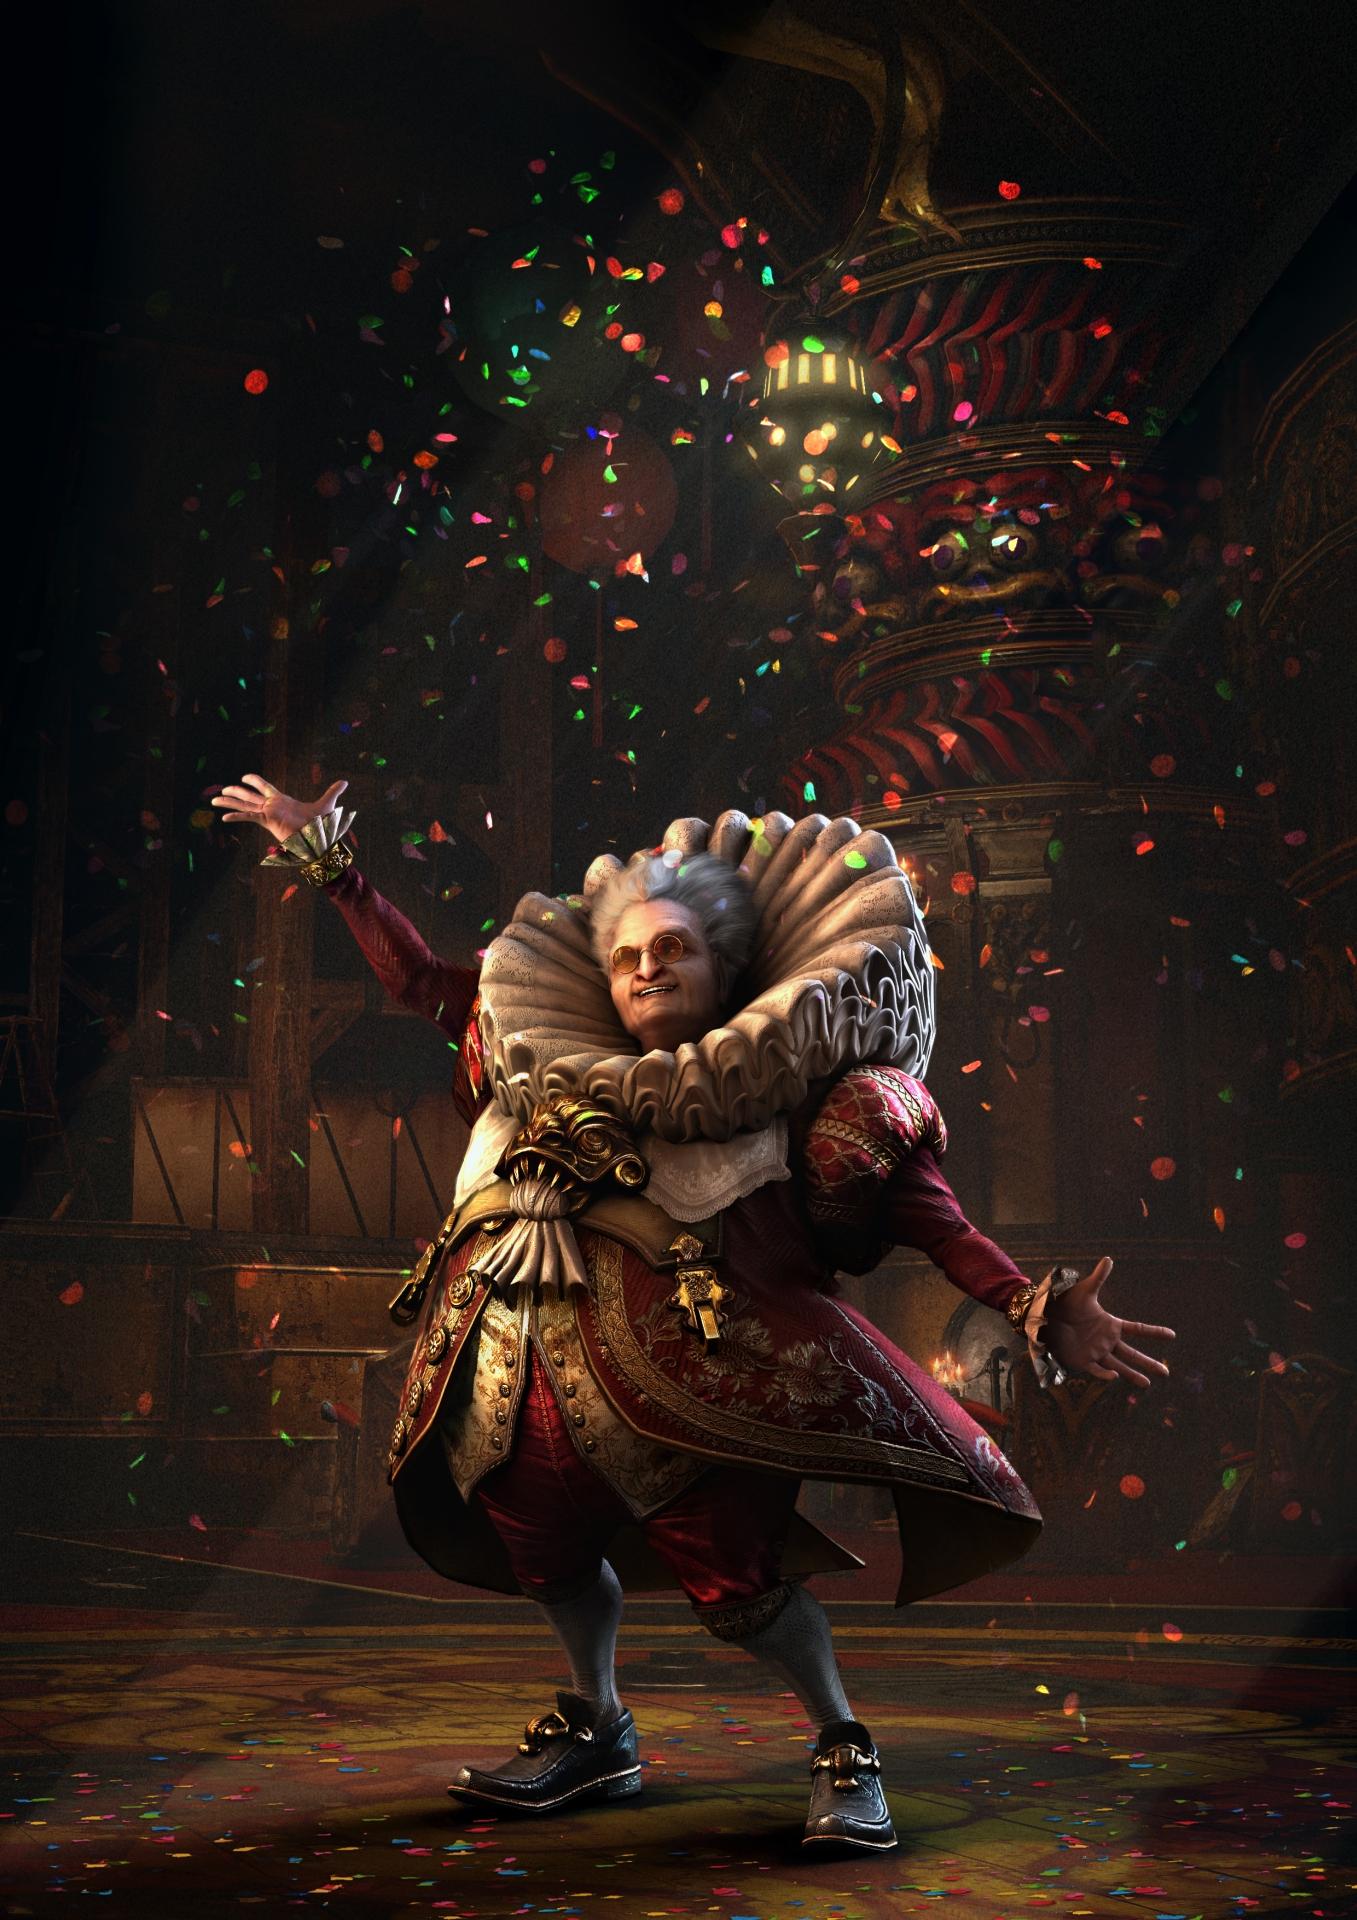 Tajemně krásné artworky z Castlevania: Lords of Shadow 2 86790